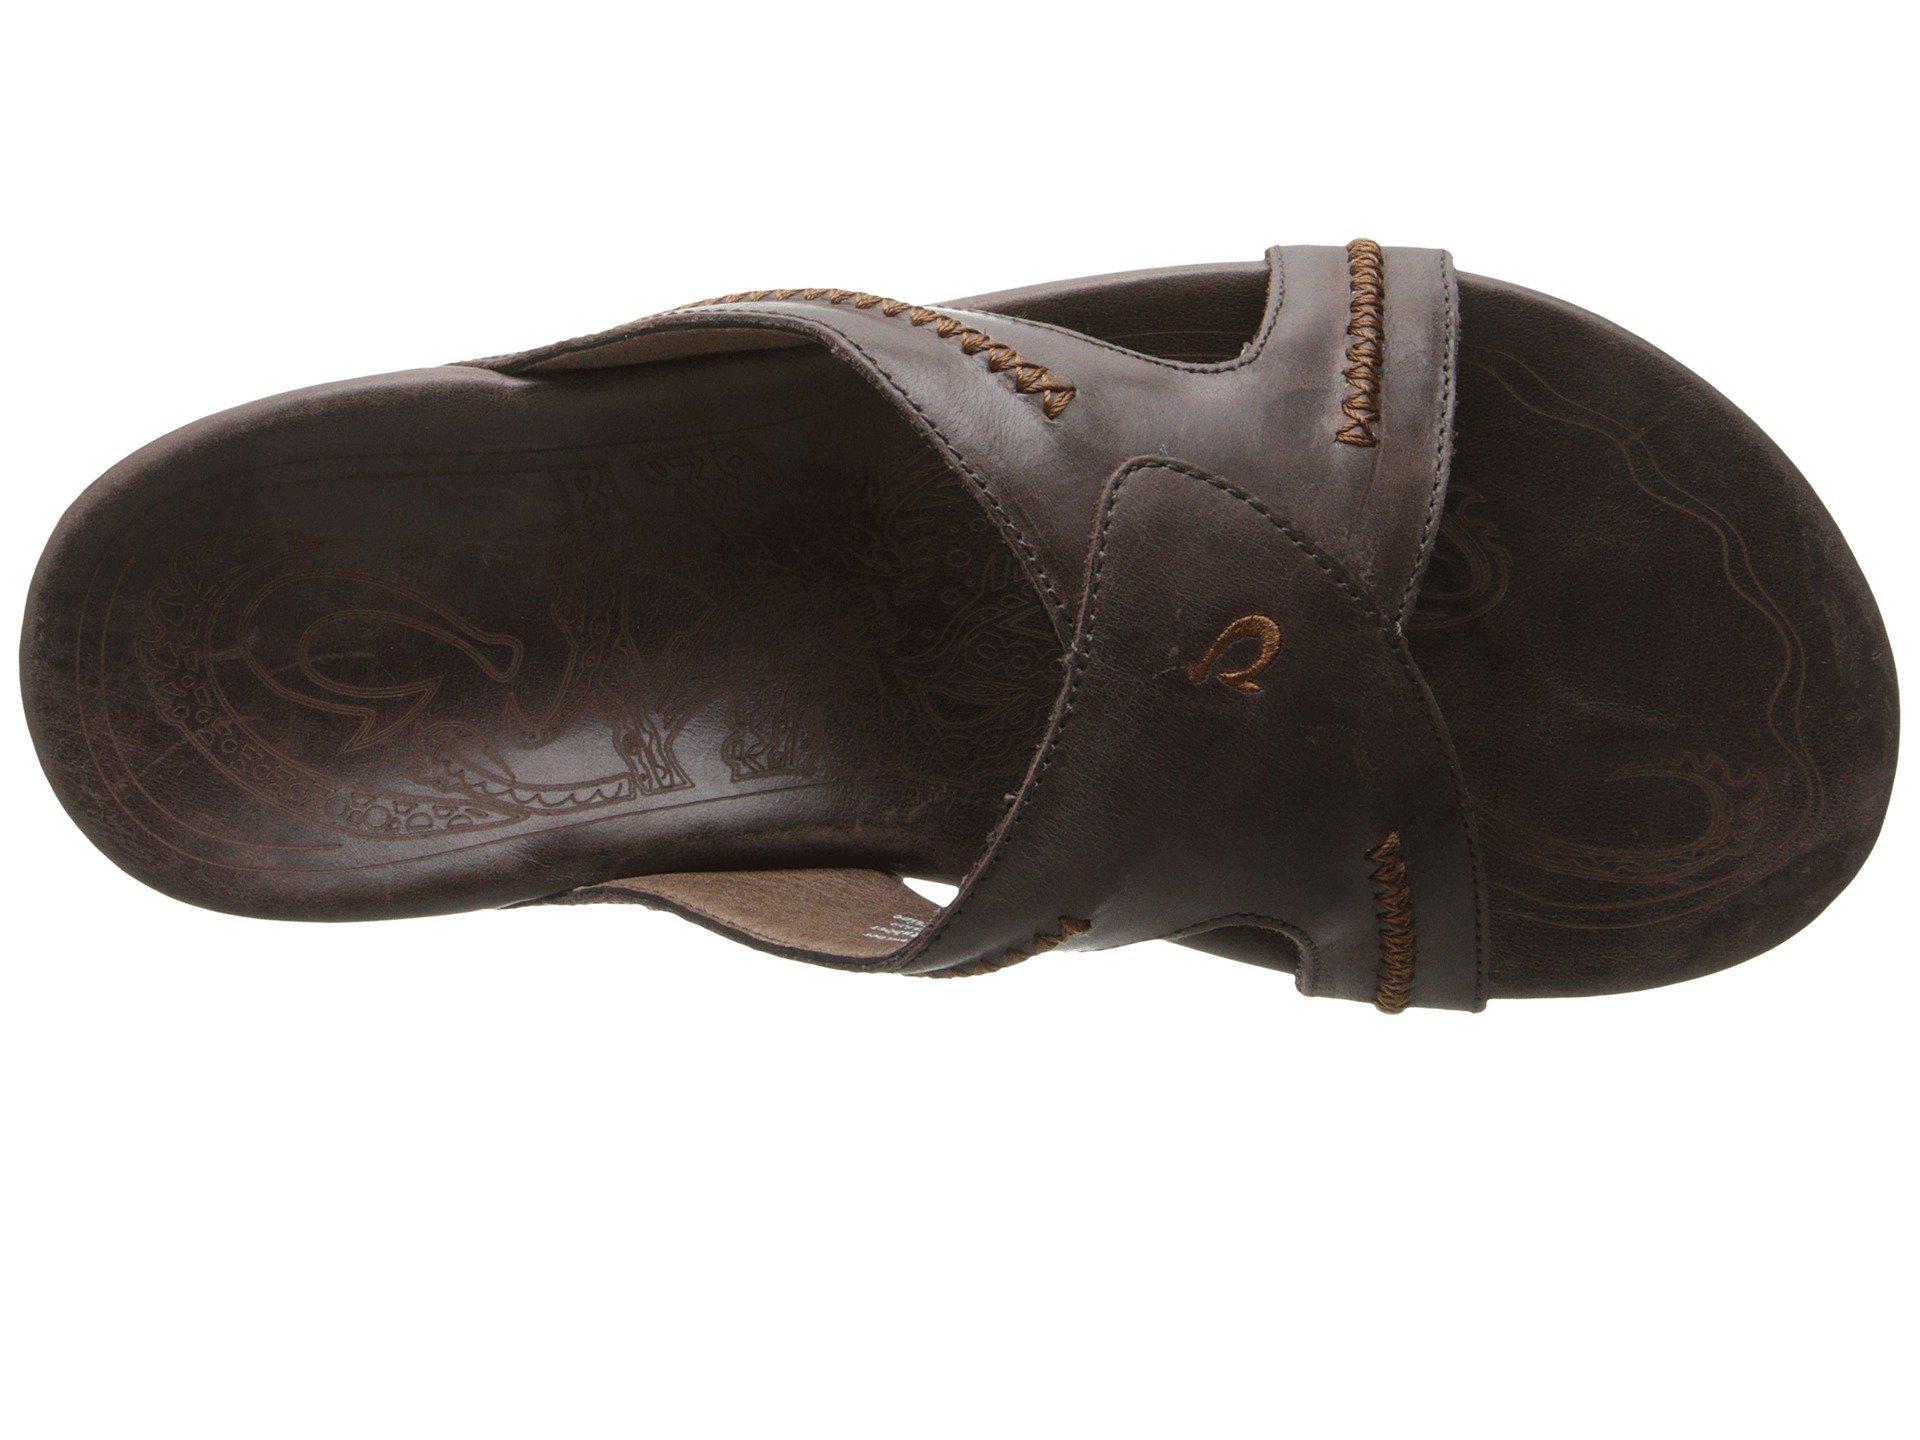 be59a8a985f Olukai - Brown Mea Ola Slide (dark Java dark Java) Men s Sandals for. View  fullscreen